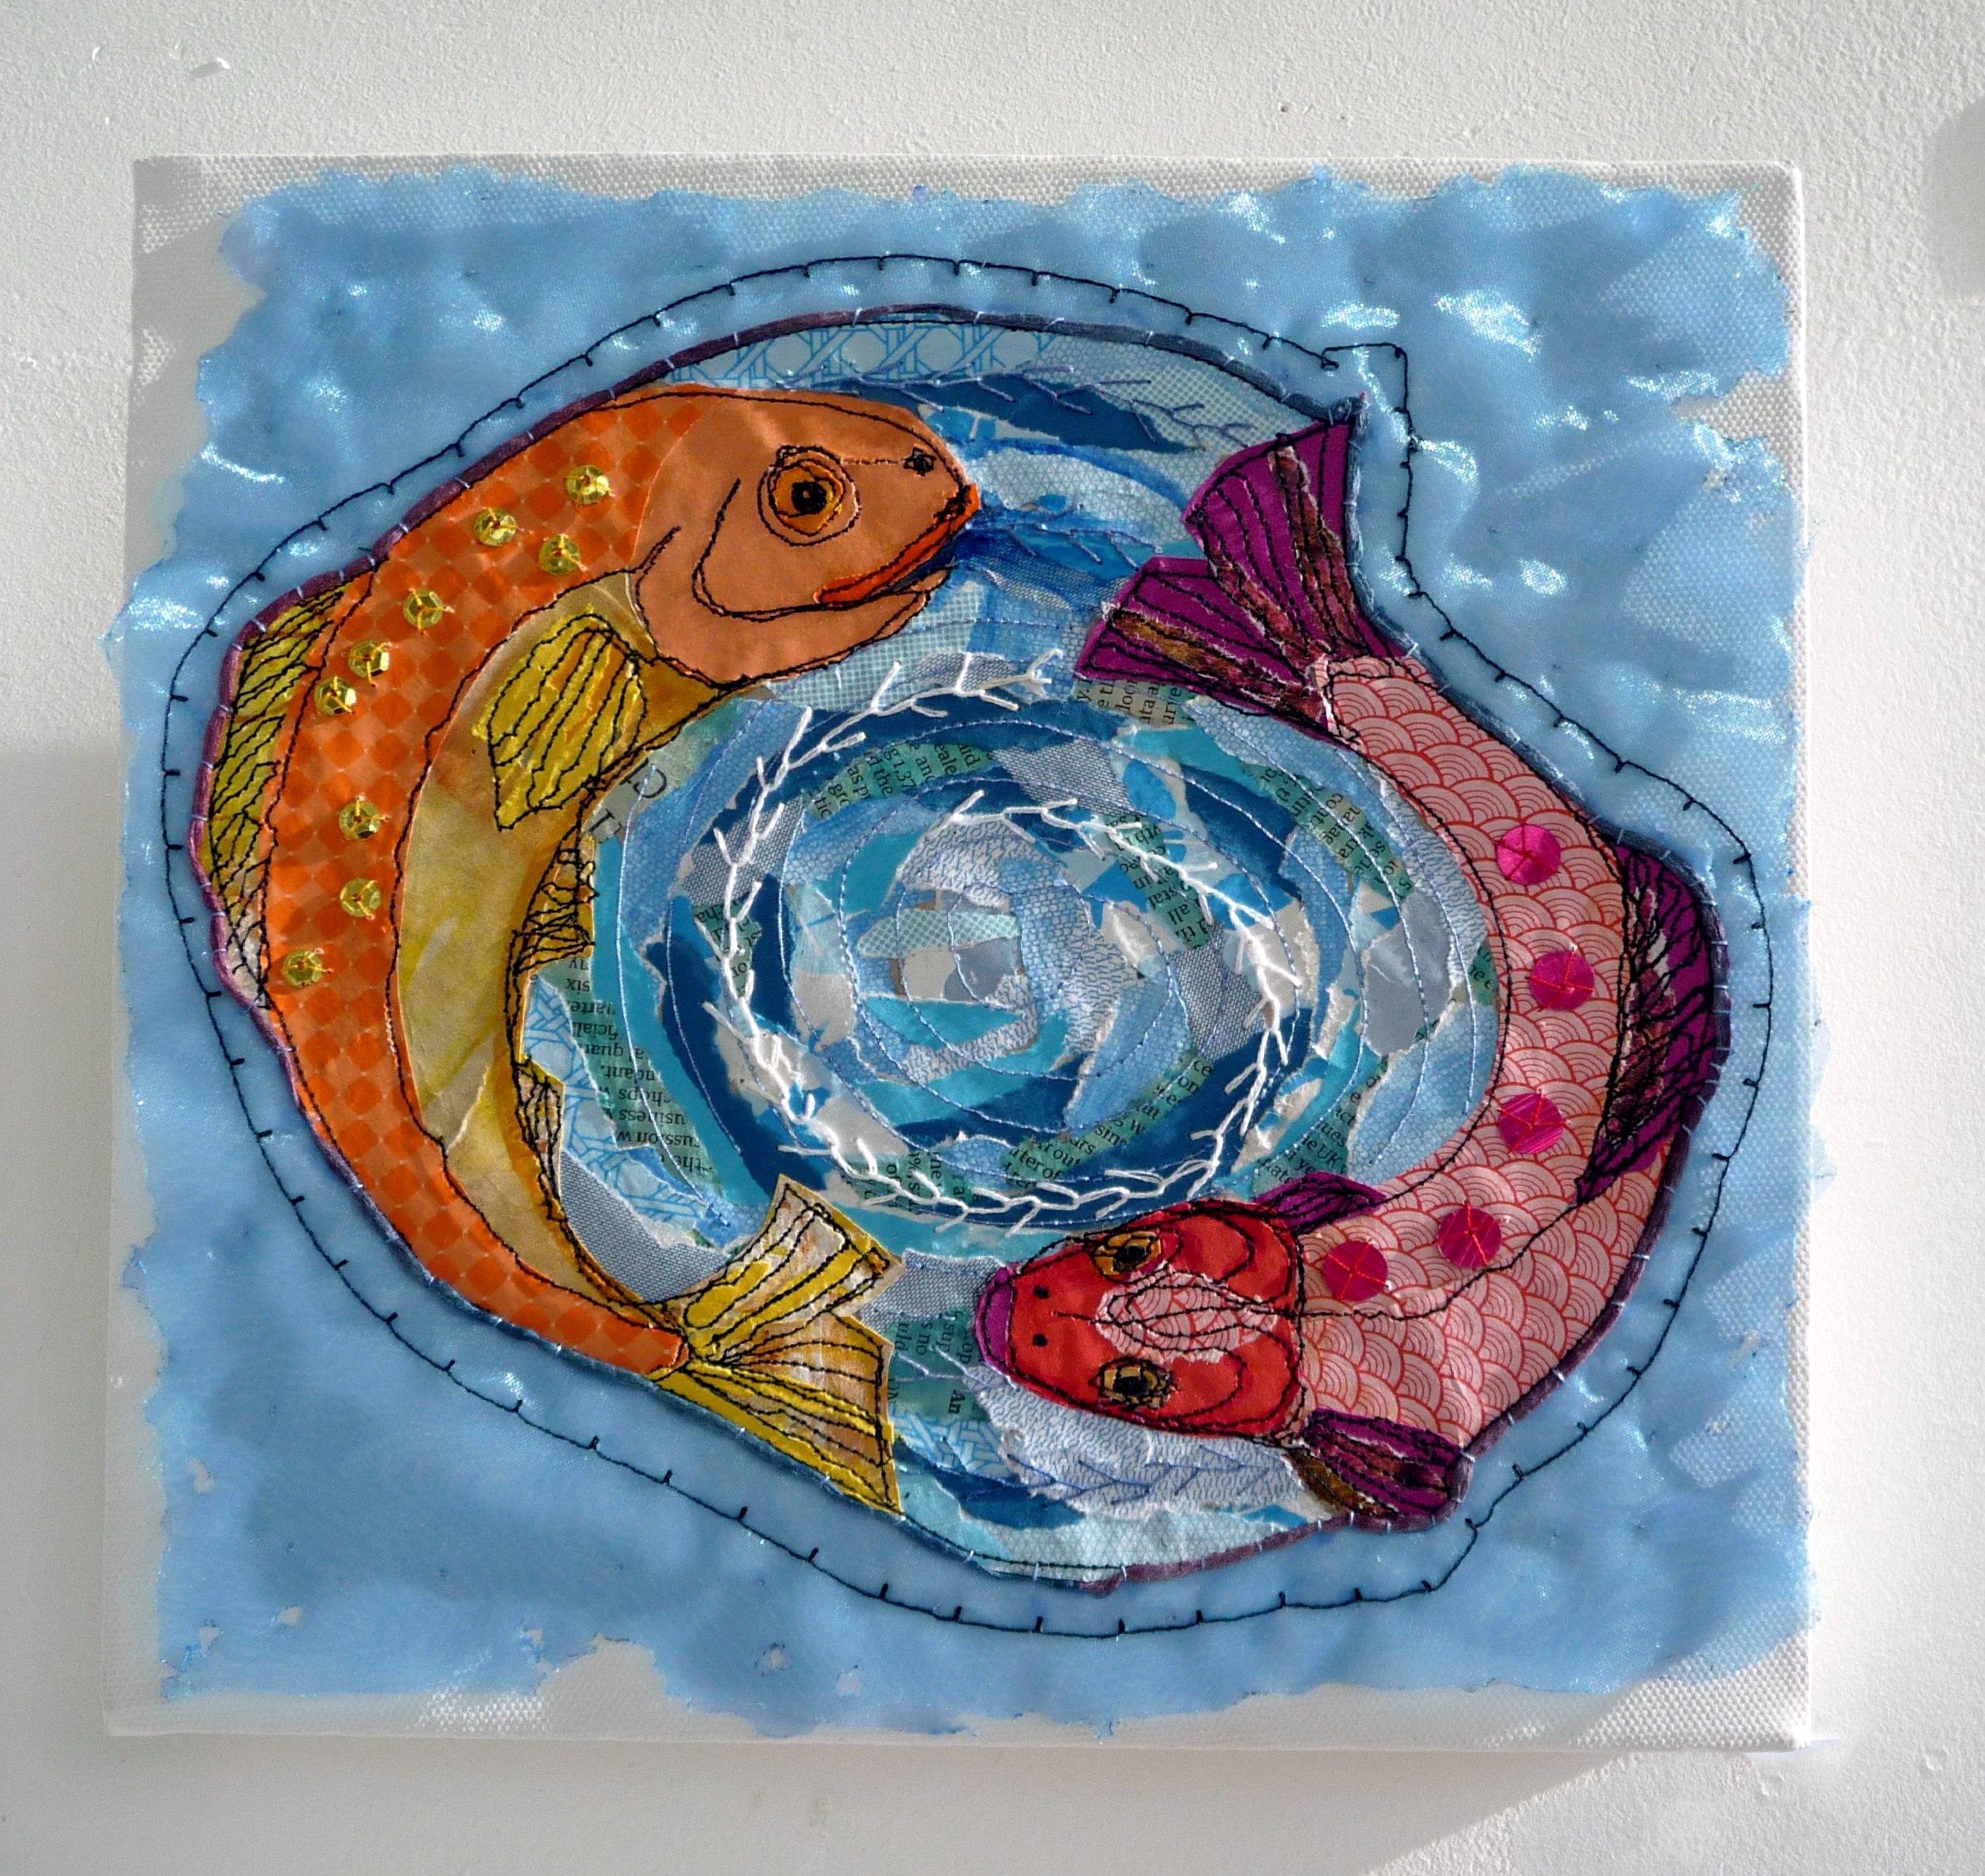 FISH GET THE STITCH by Sue Boardman, stitched paper